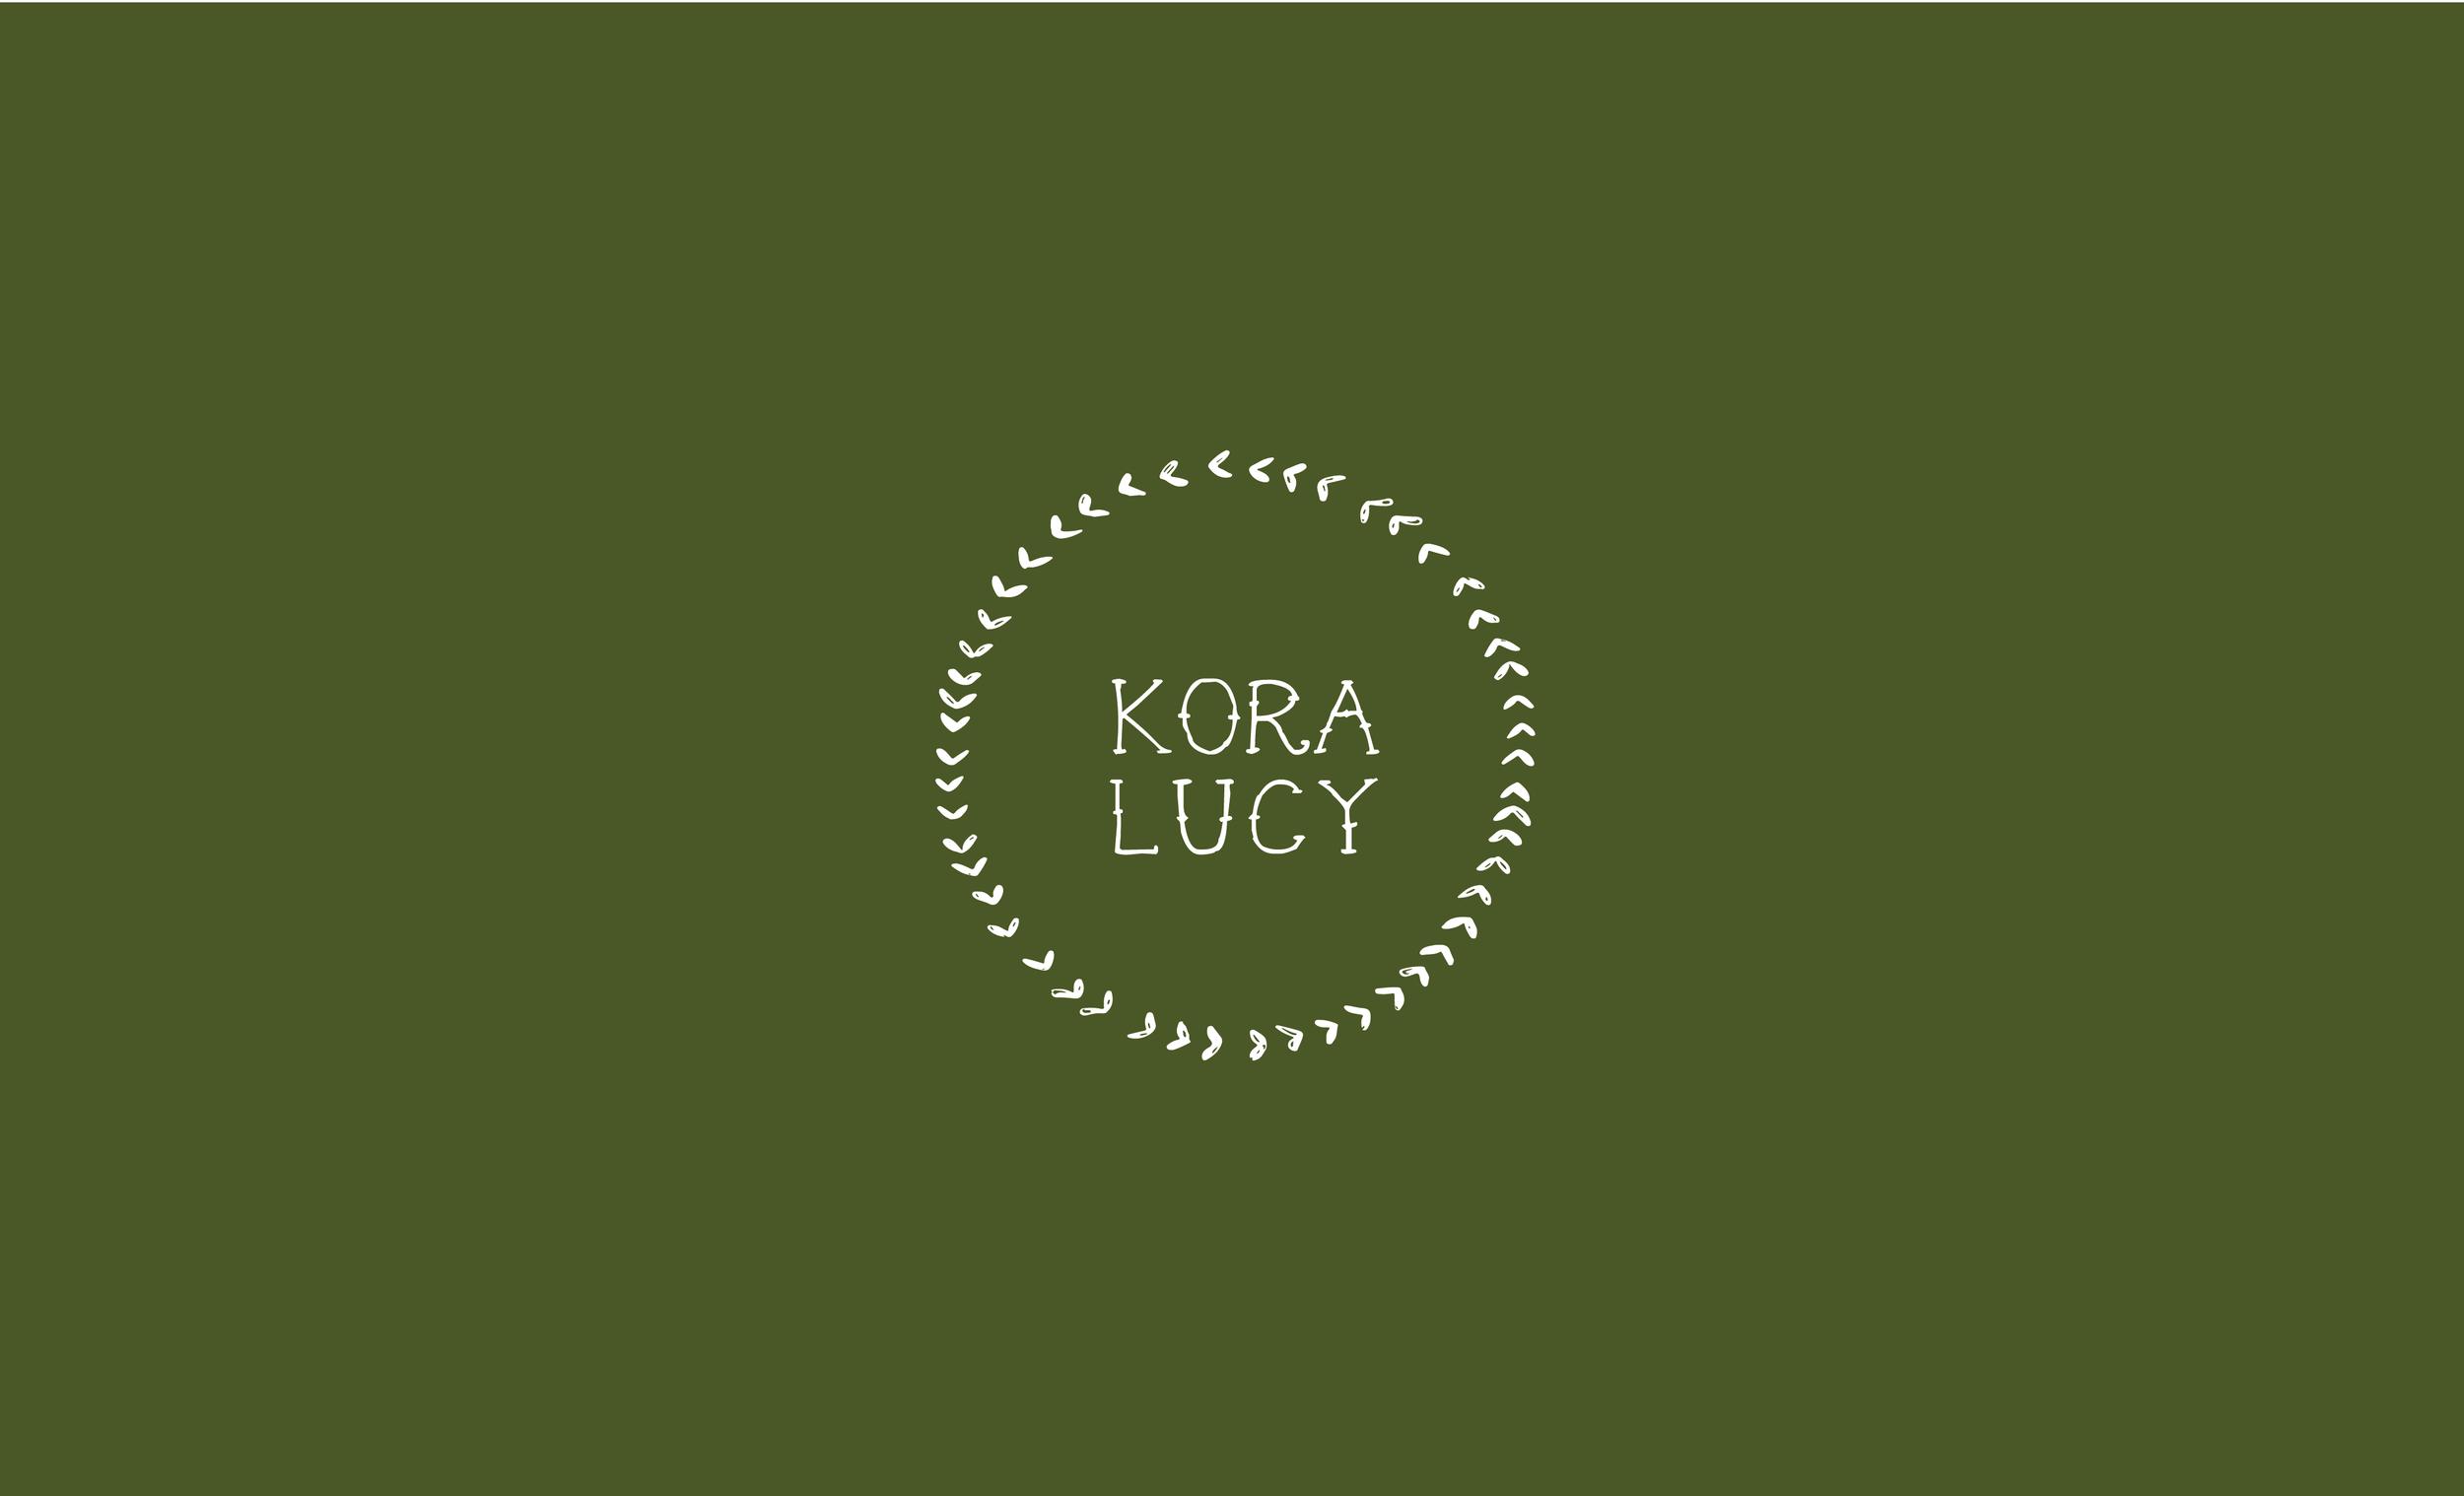 kora-lucy-photography-brand-design-1